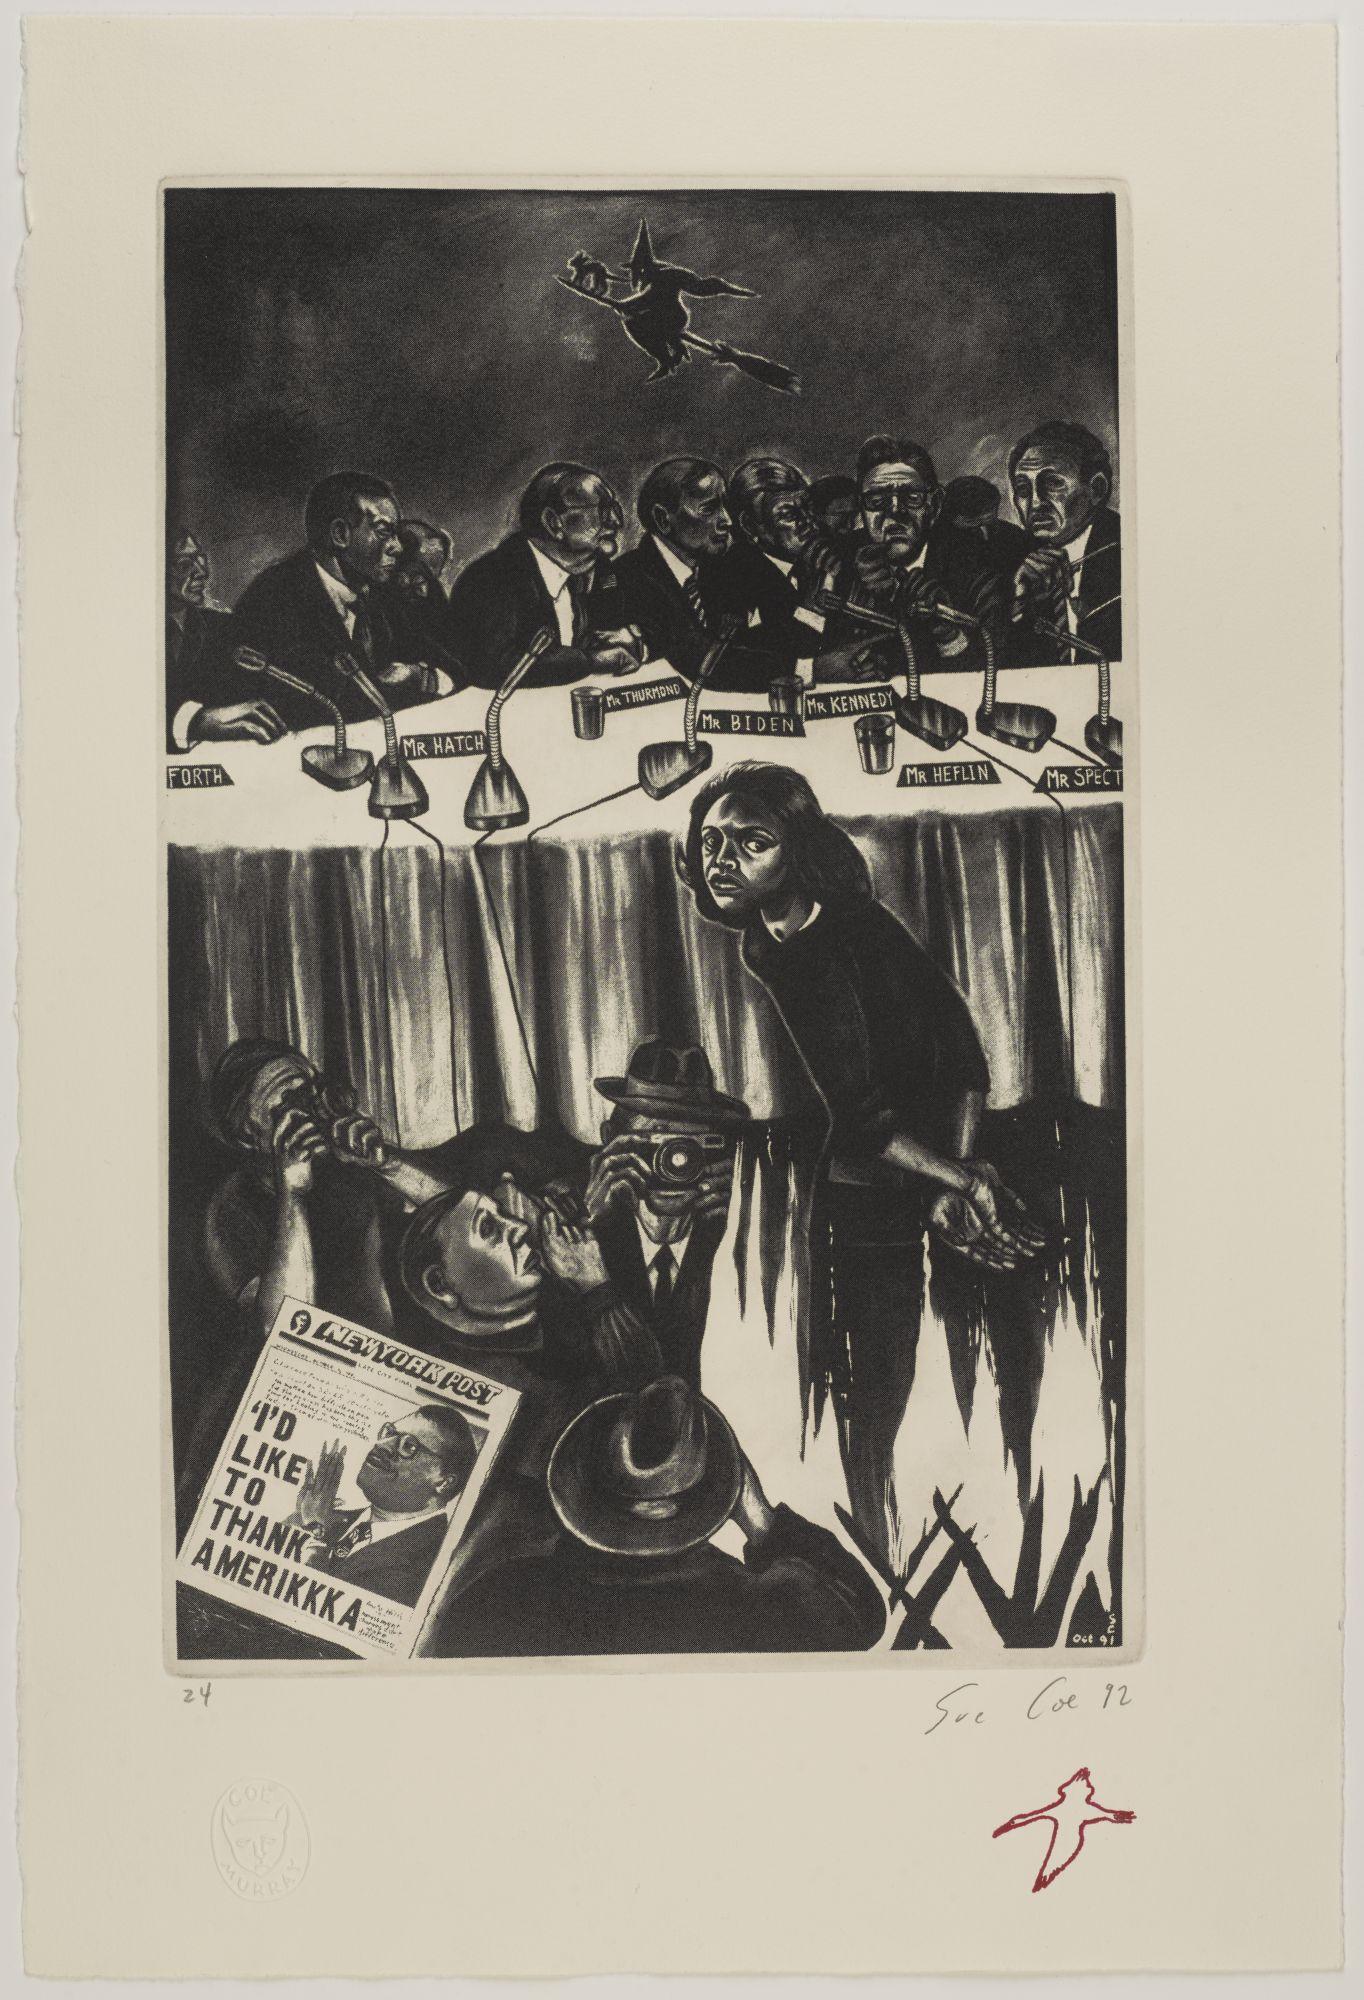 Sue Coe (born Tamworth, Staffordshire, United Kingdom, 1951).  Untitled (Anita Hill Trial) , 1992. Etching on paper, 20 x 13 ¼ in. (50.8 x 33.7 cm). Brooklyn Museum; Gift of Marco Nocella, 2012.90. © Sue Coe. Courtesy Galerie St. Etienne, New York. (Photo: Jonathan Dorado, Brooklyn Museum)